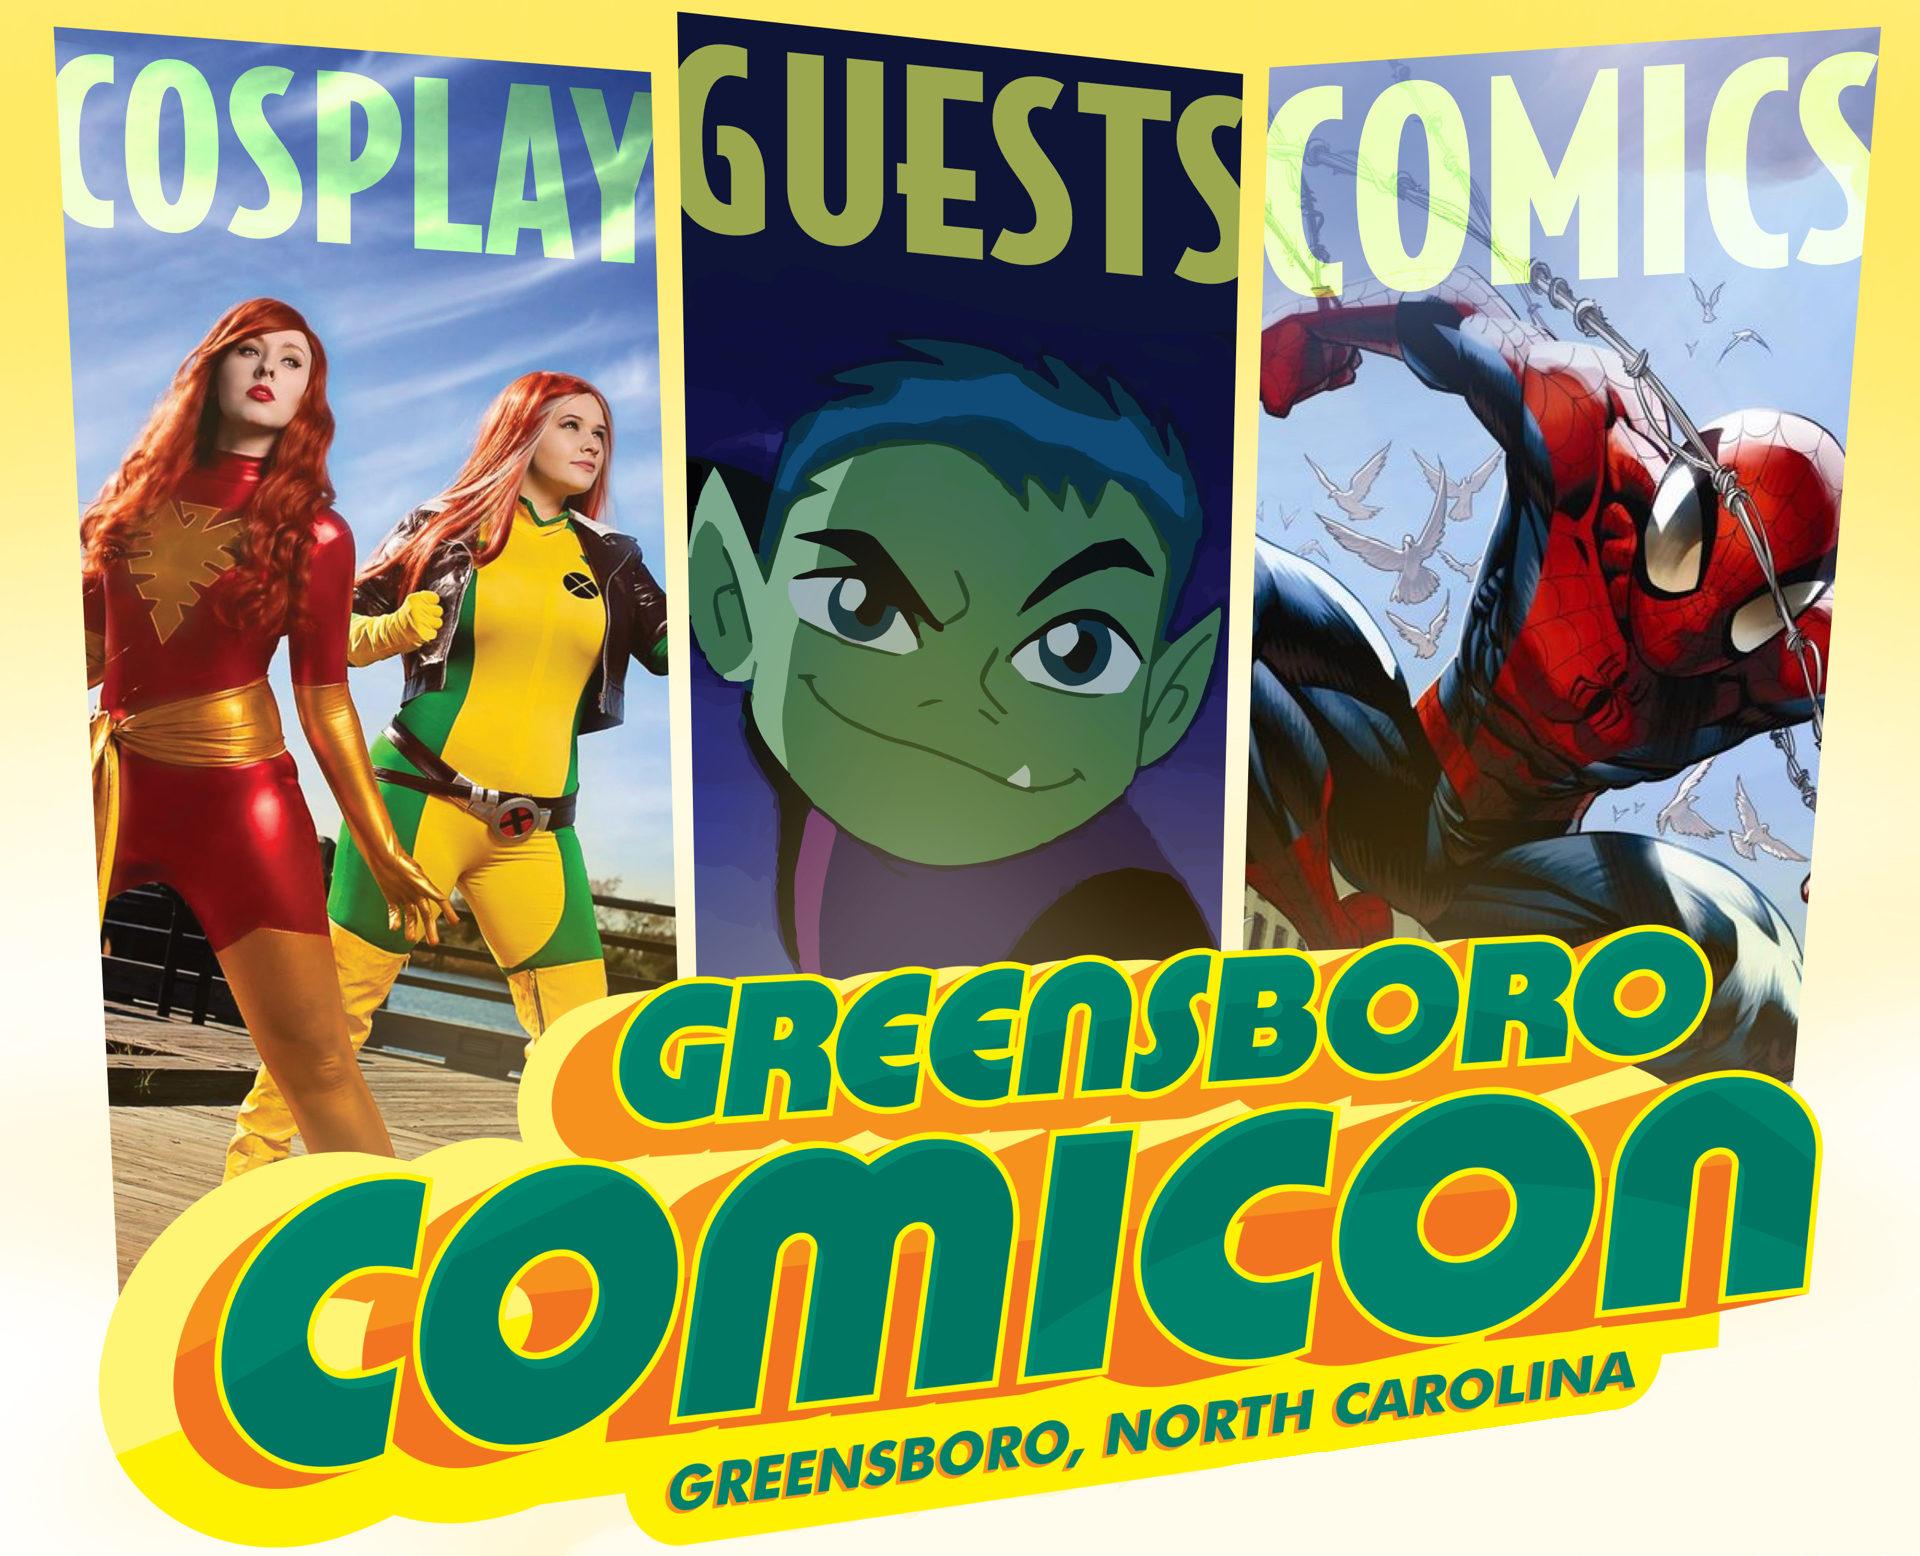 cropped-circus-poster-header-2-1.jpg